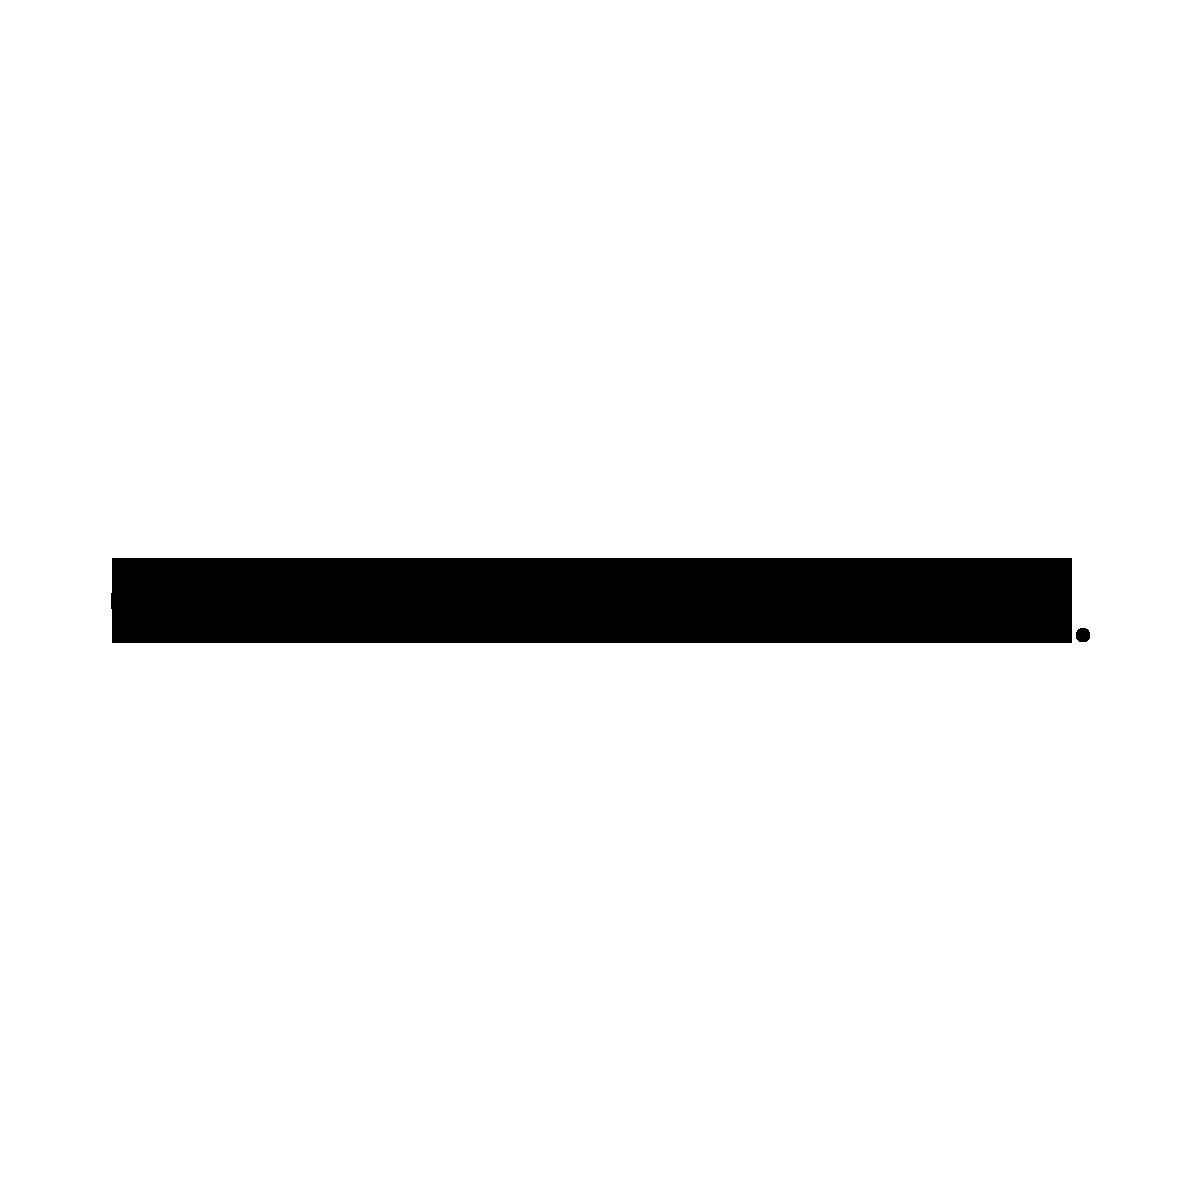 Sneaker-mit-Felldetail-Weiß